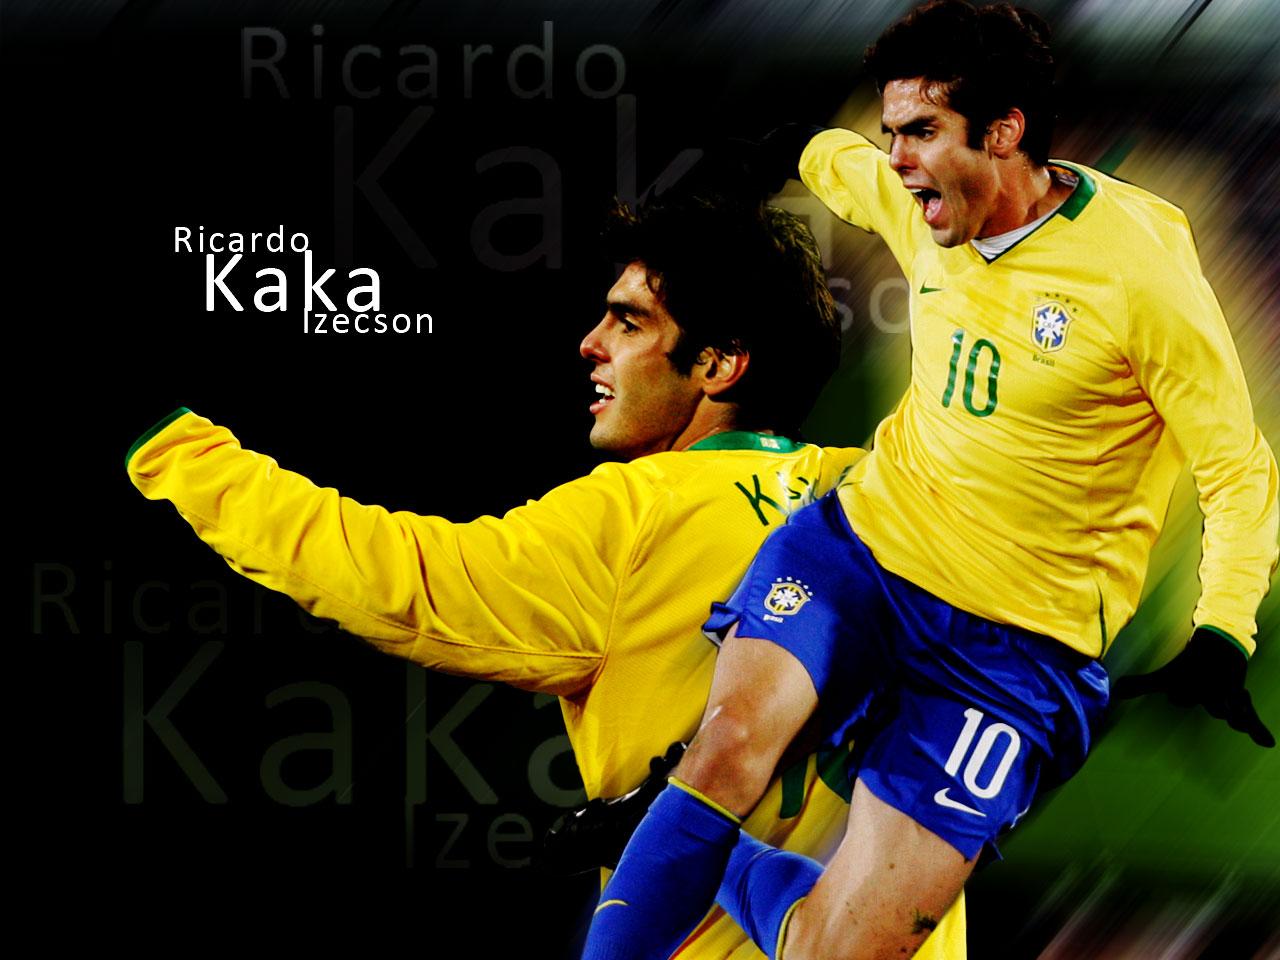 Ricardo Kaka Wallpapers Hd Football Wallpaper Kaka Wallpapers Ricardo Kaka Best